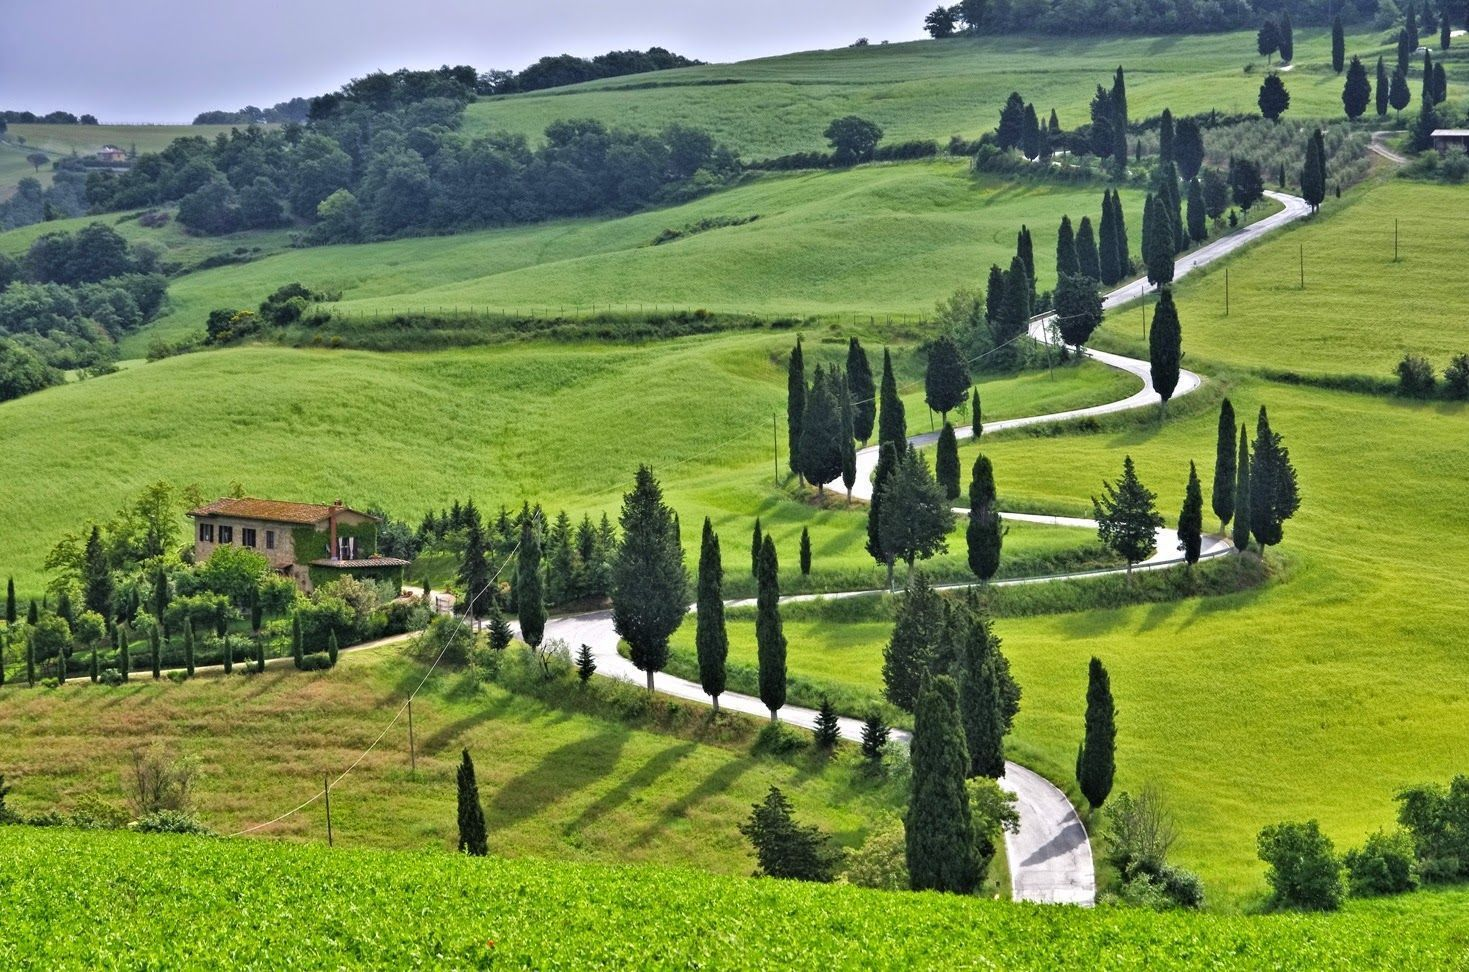 Carreteras de la Toscana